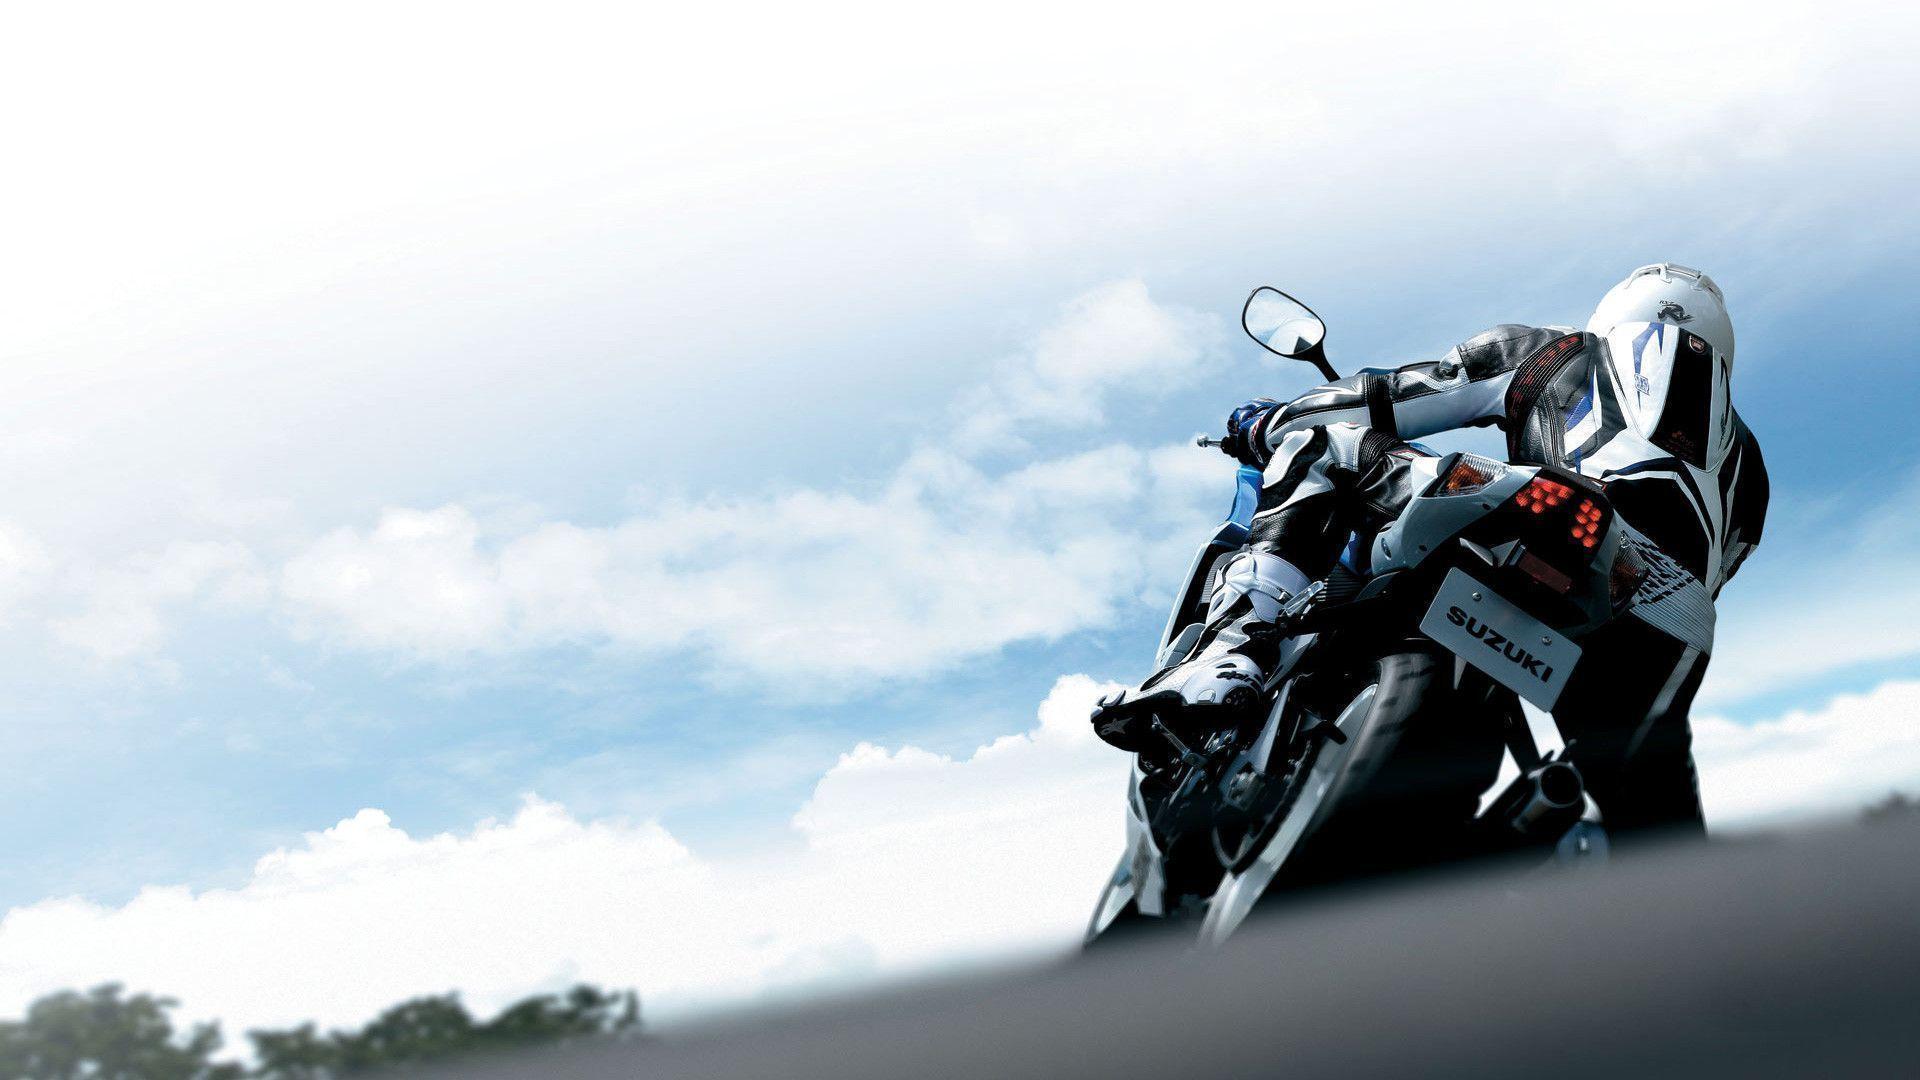 Suzuki Gsxr 1000 Wallpaper Hd Free Download #1585 Wallpaper ...